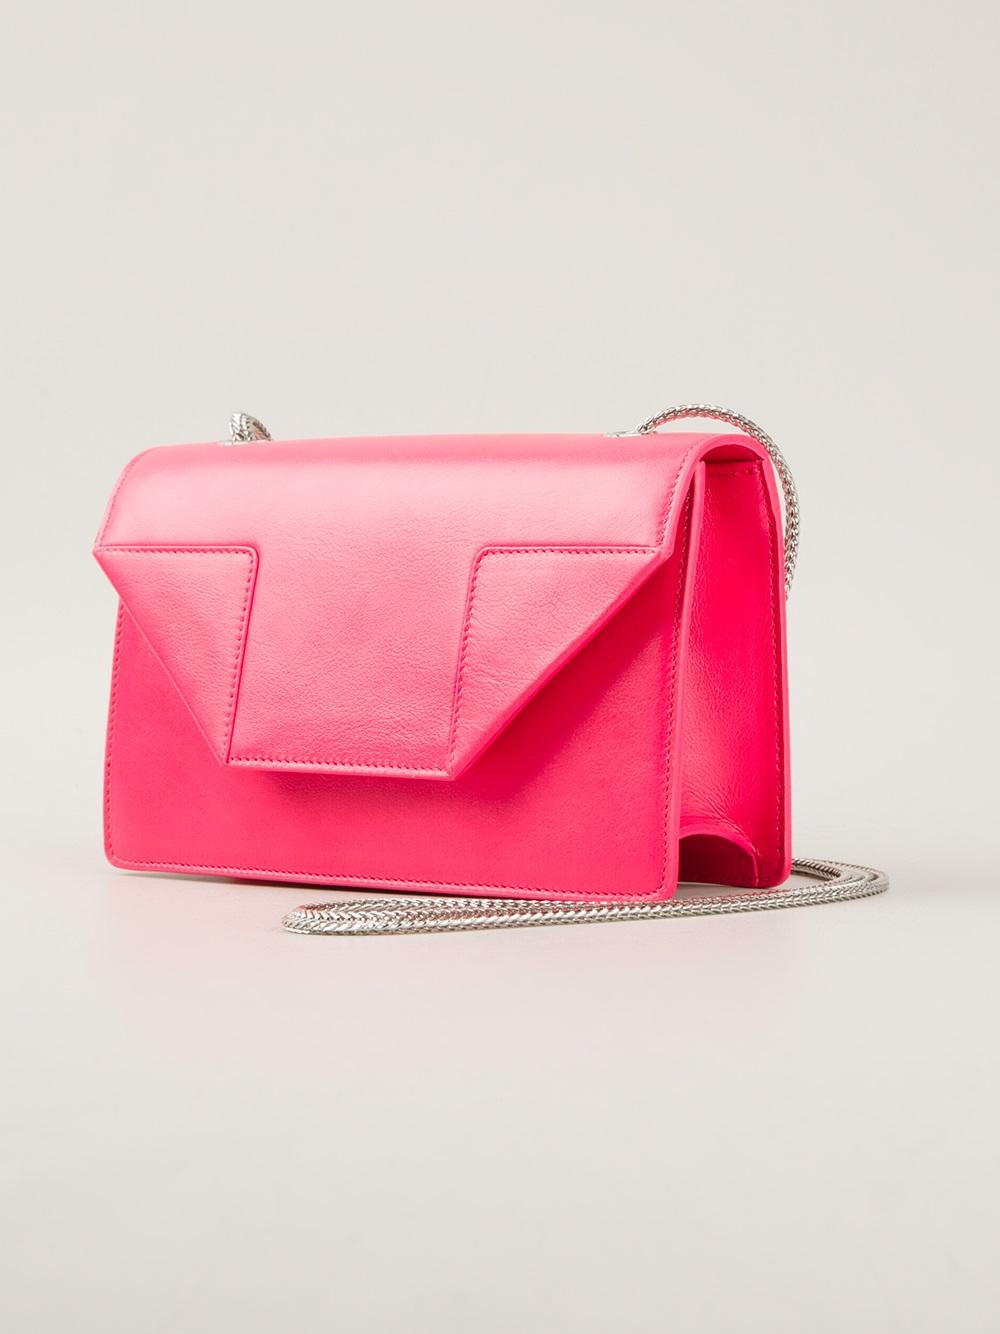 replica ysl betty small pink